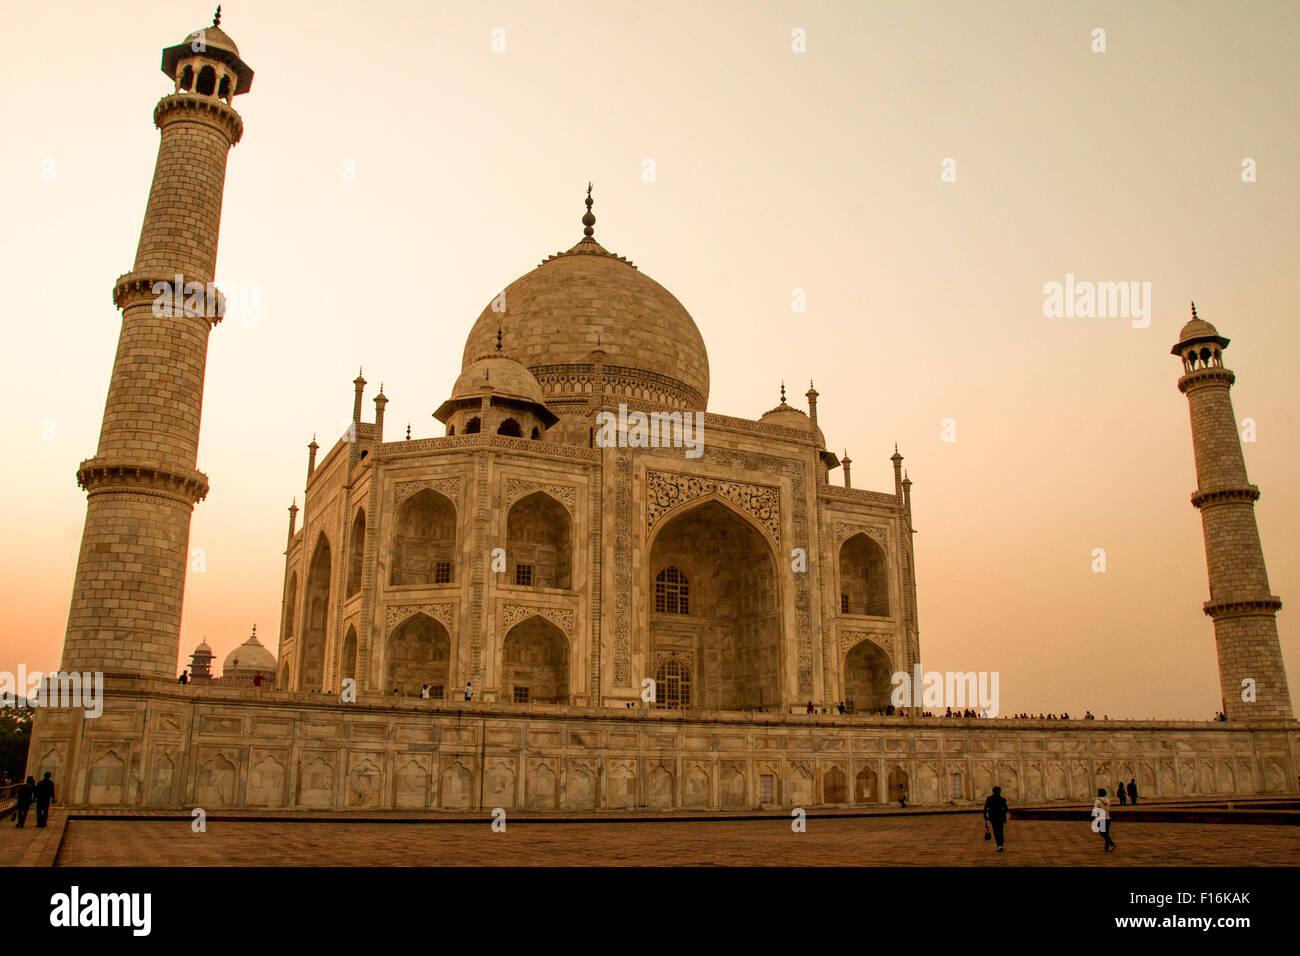 Taj Mahal at sunset, Agra, India. - Stock Image